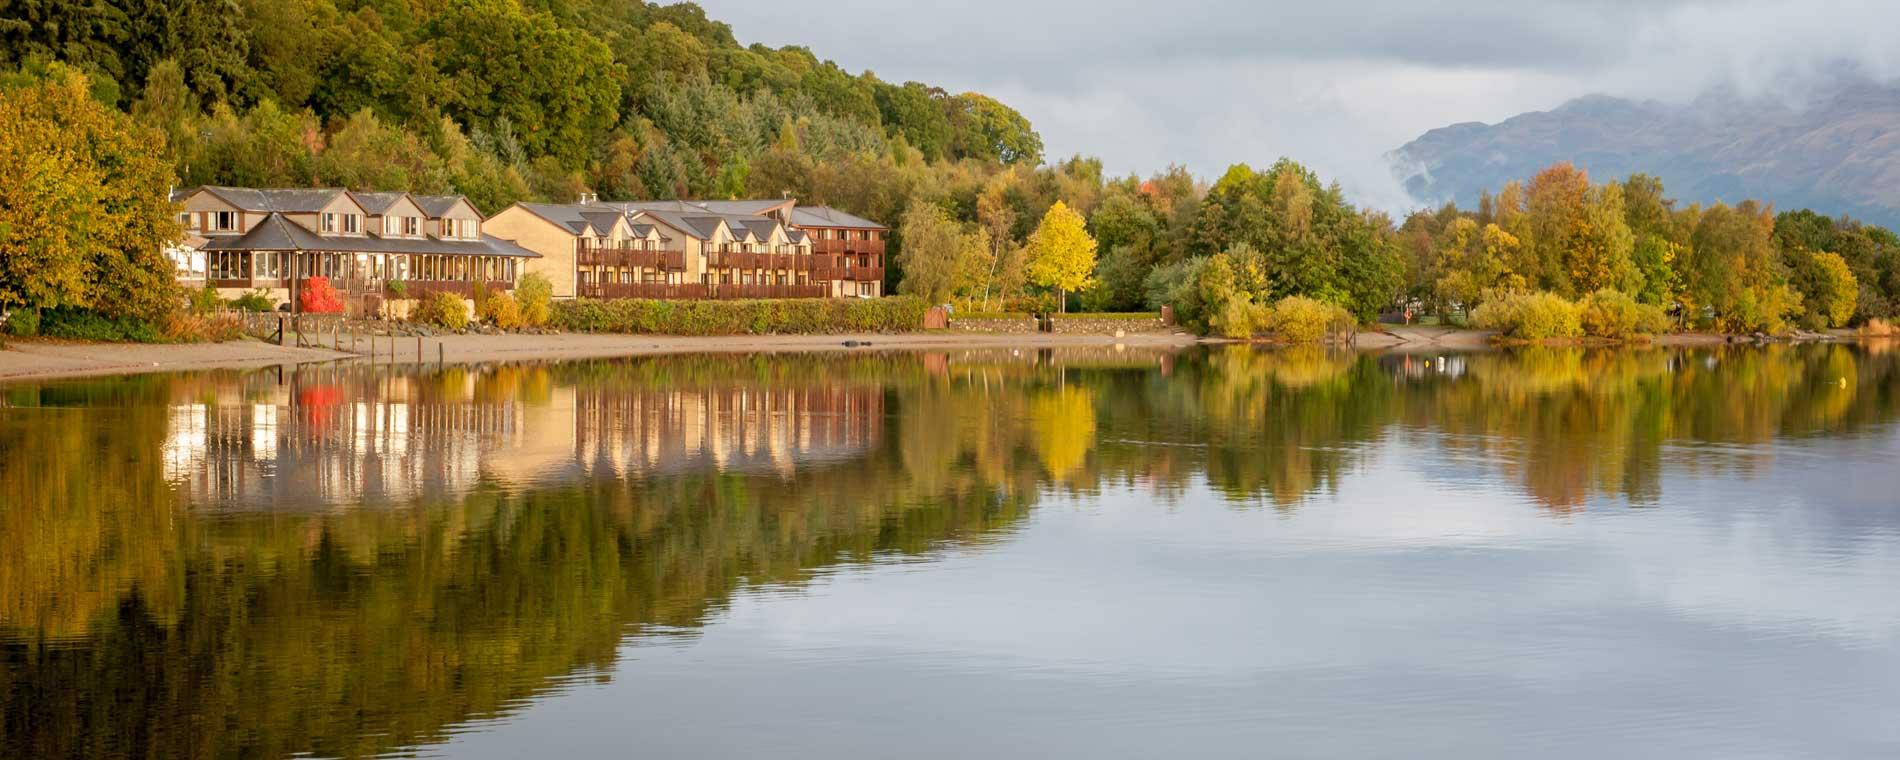 Lodge on Loch Lomond exterior photo